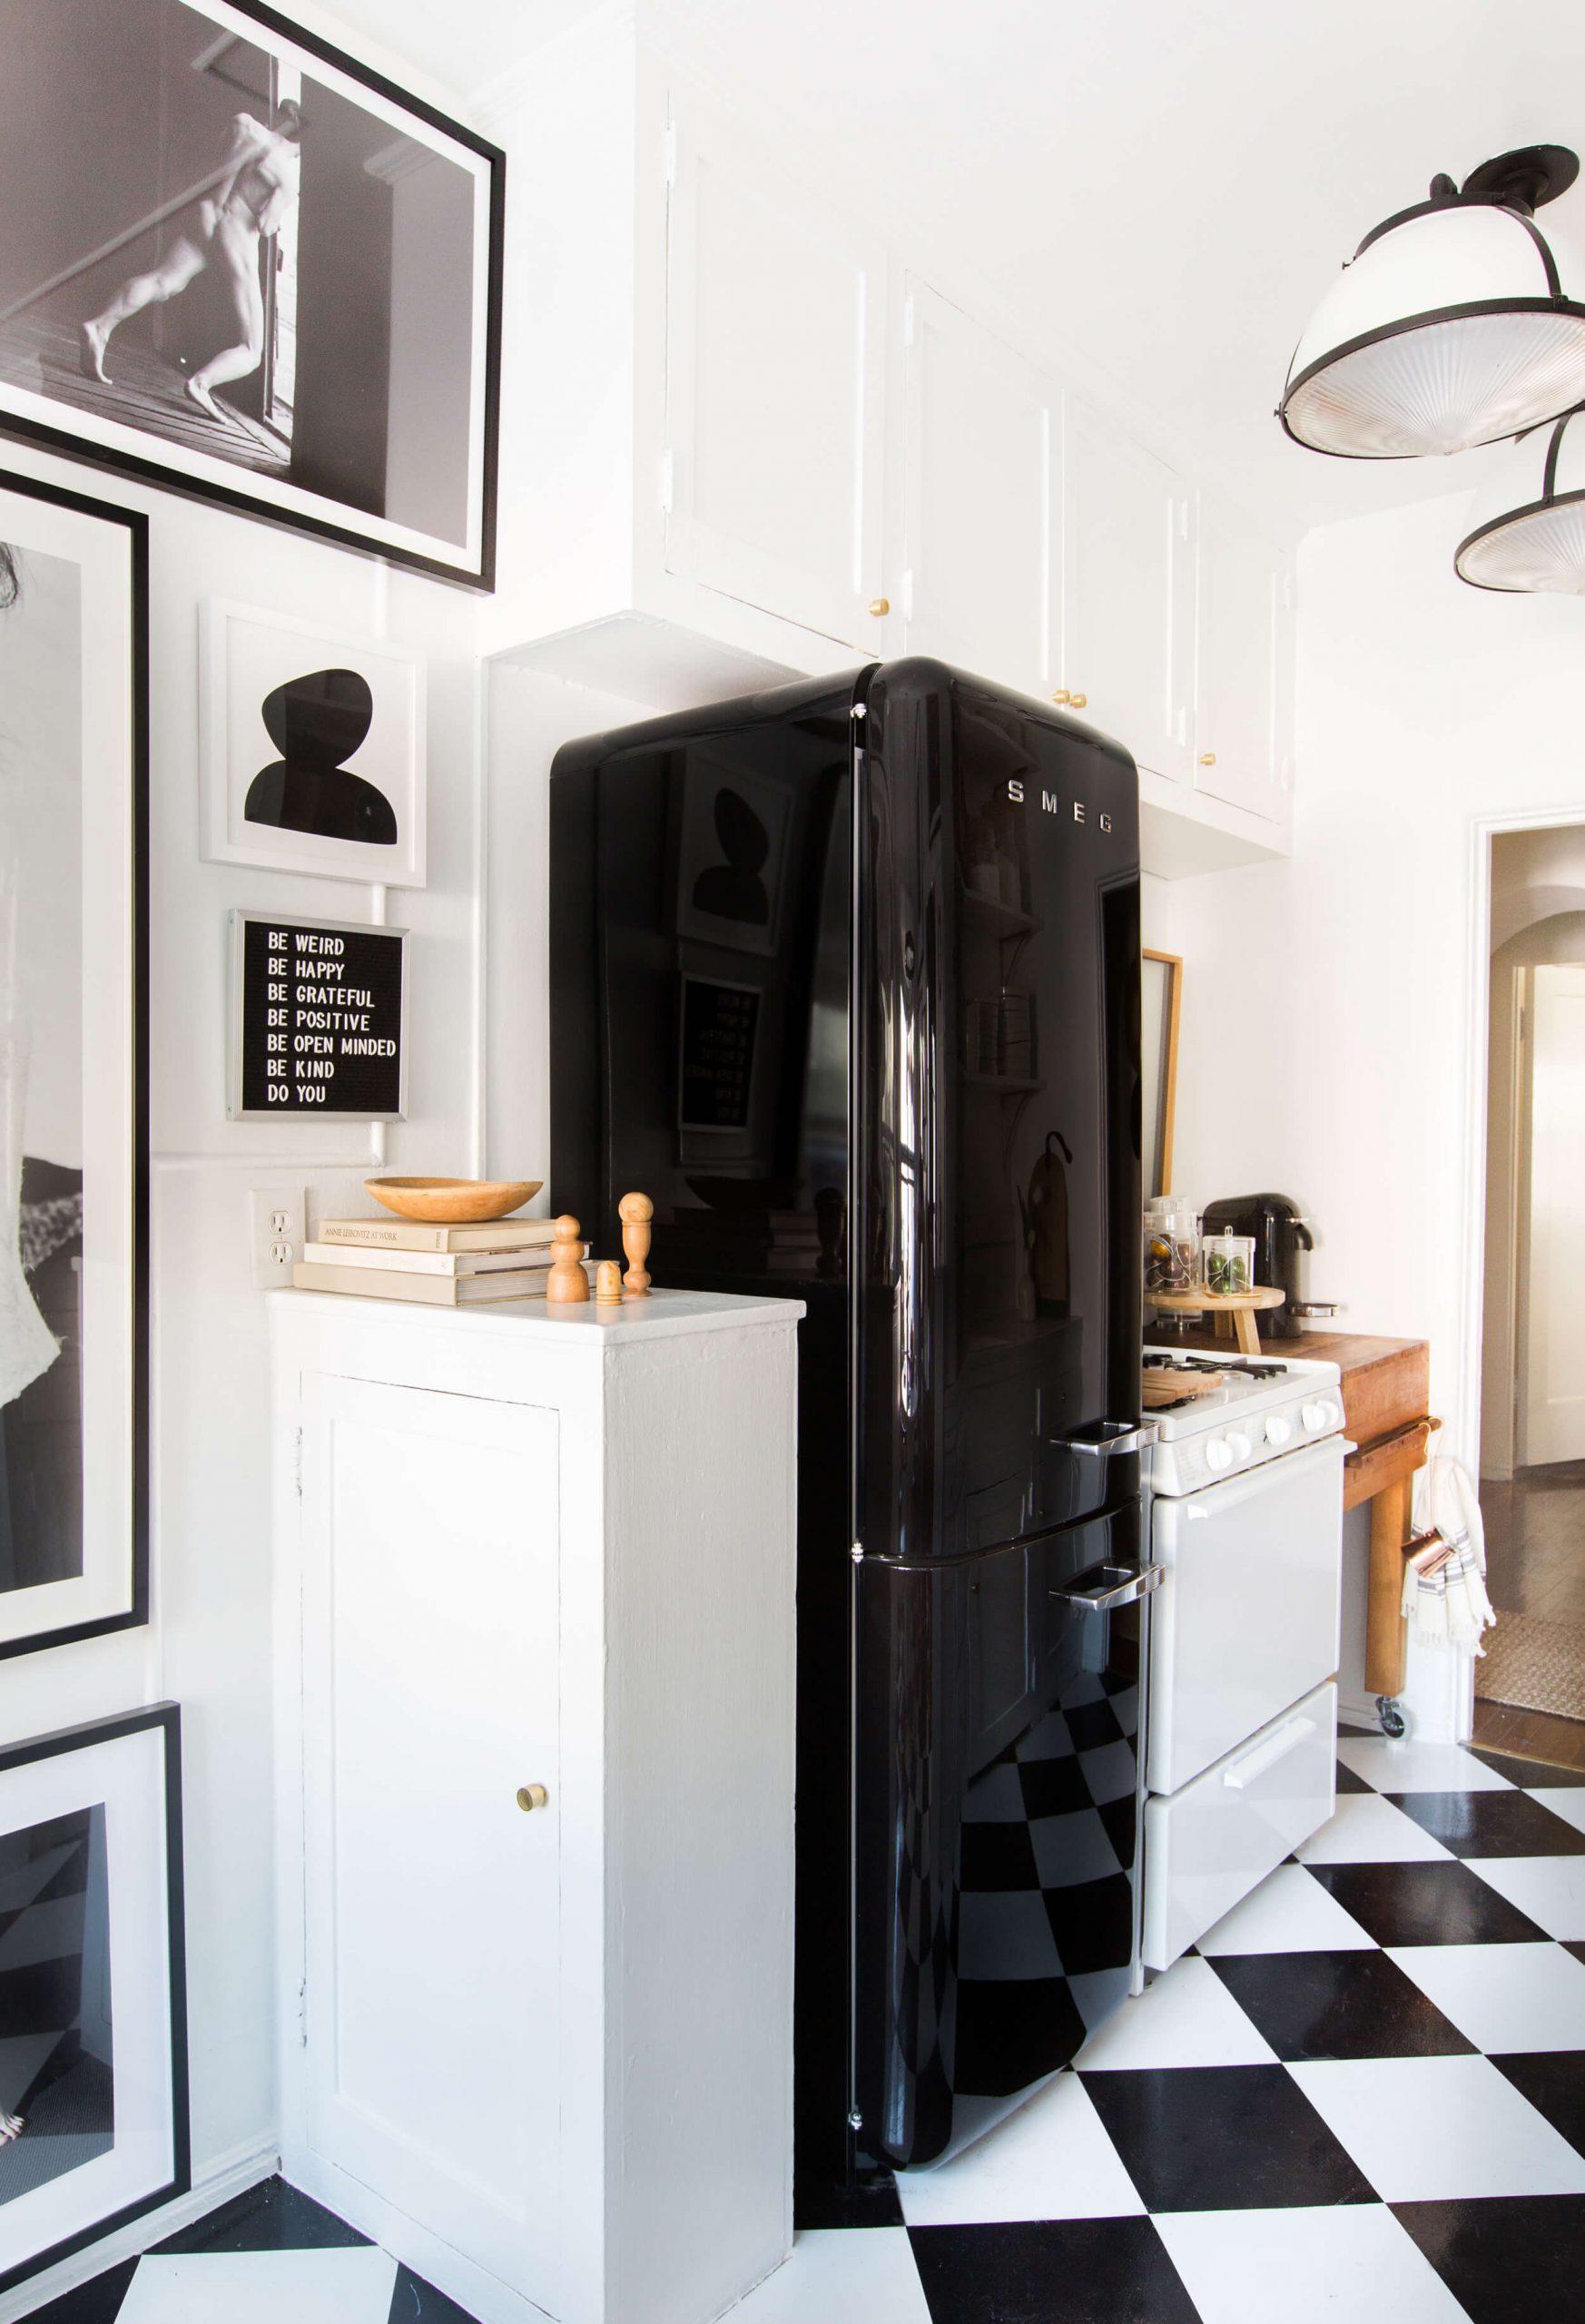 Image of: 30 Retro Kitchen Ideas Tables Chairs And Retro Kitchen Decor